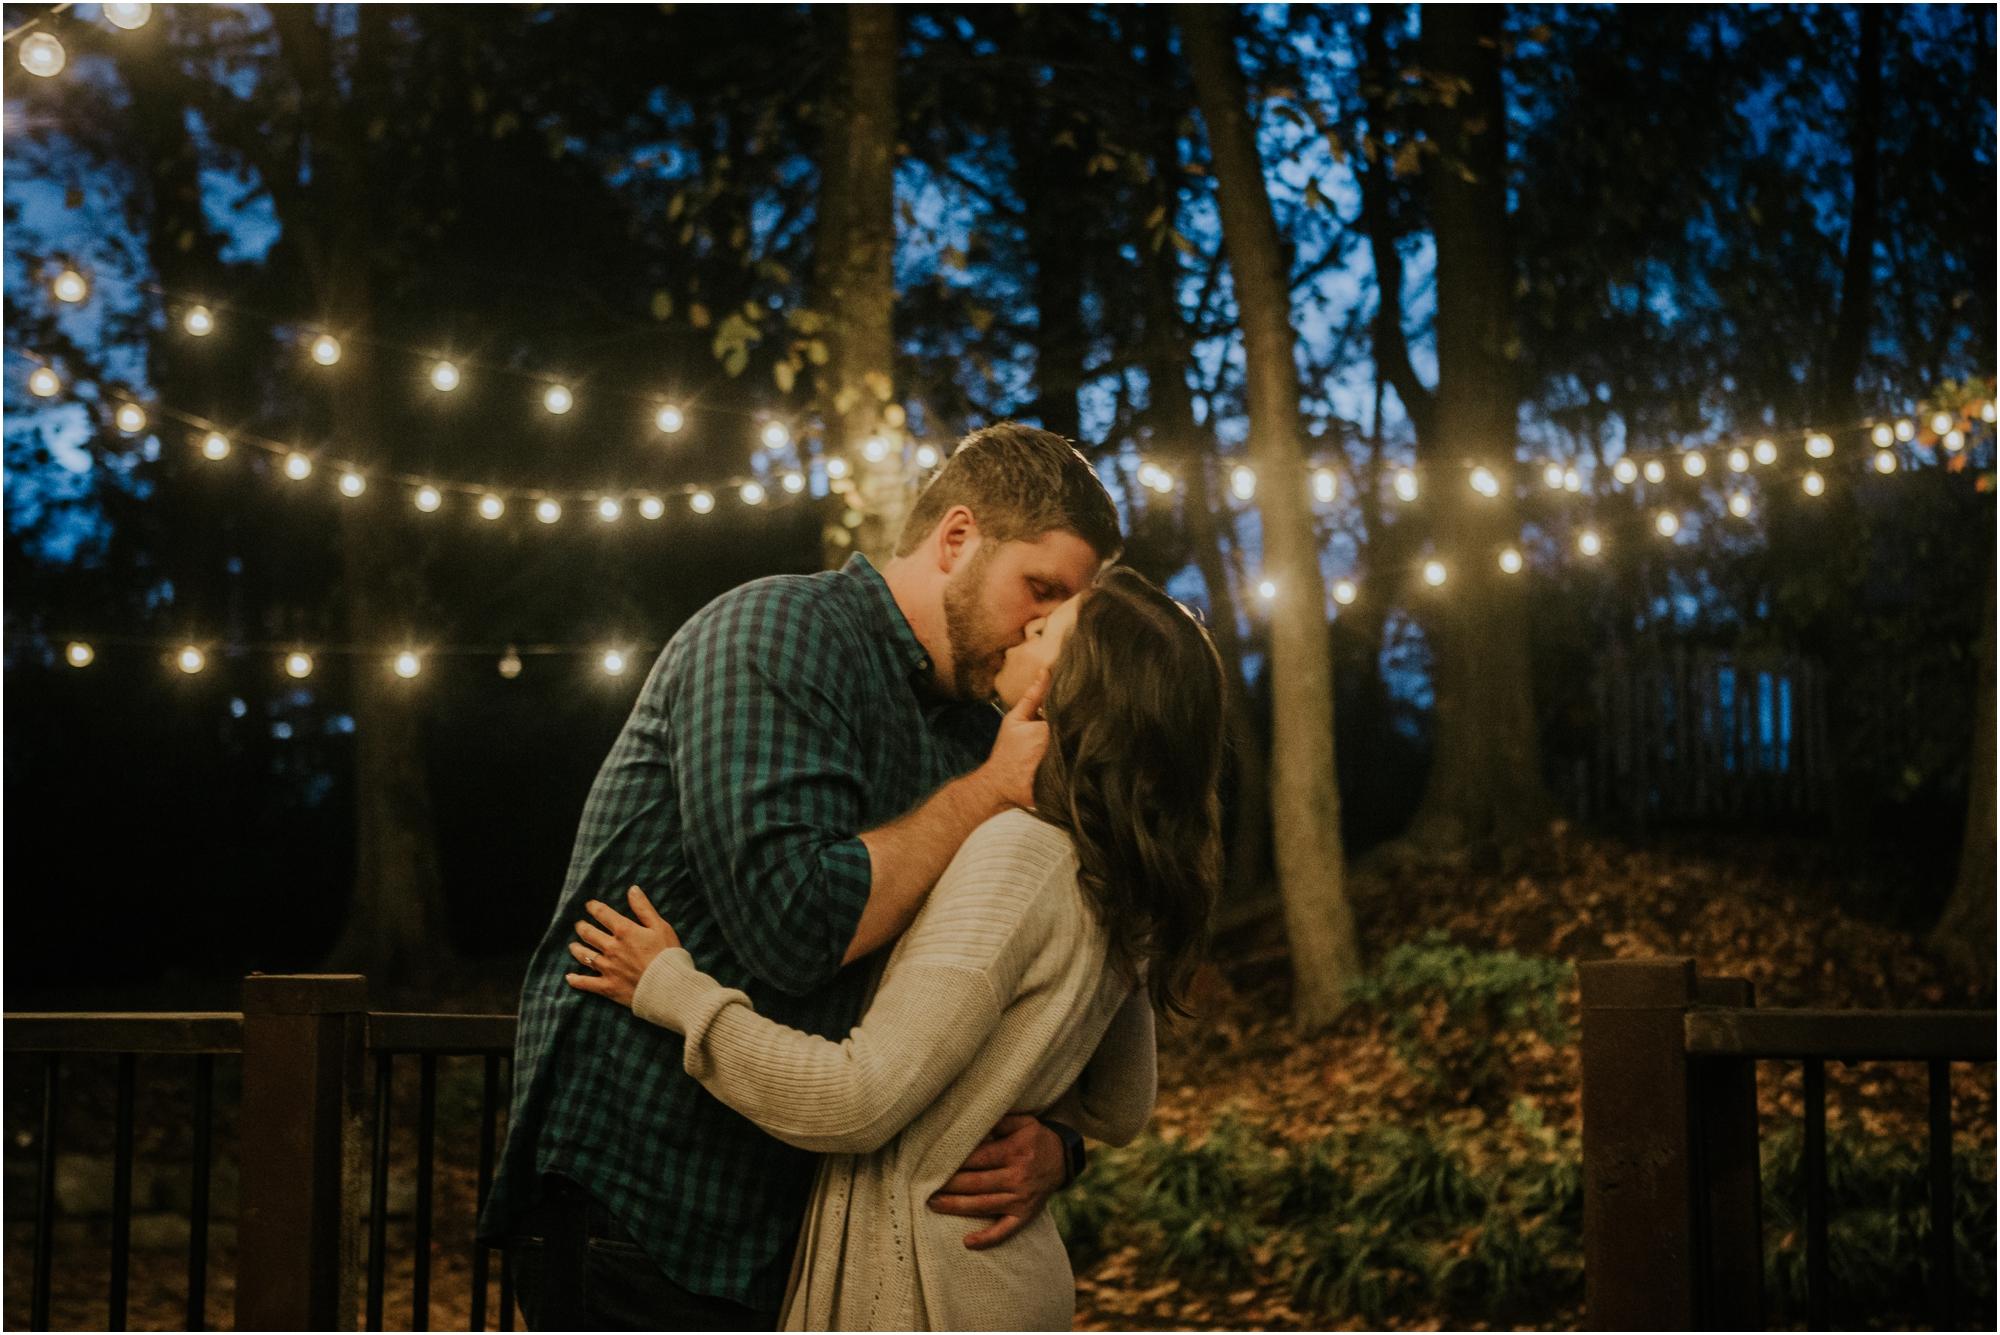 katy-sergent-millstone-limestone-tn-rustic-fall-engagement-session-adventurous-outdoors-intimate-elopement-wedding-northeast-johnson-city-photographer_0046.jpg